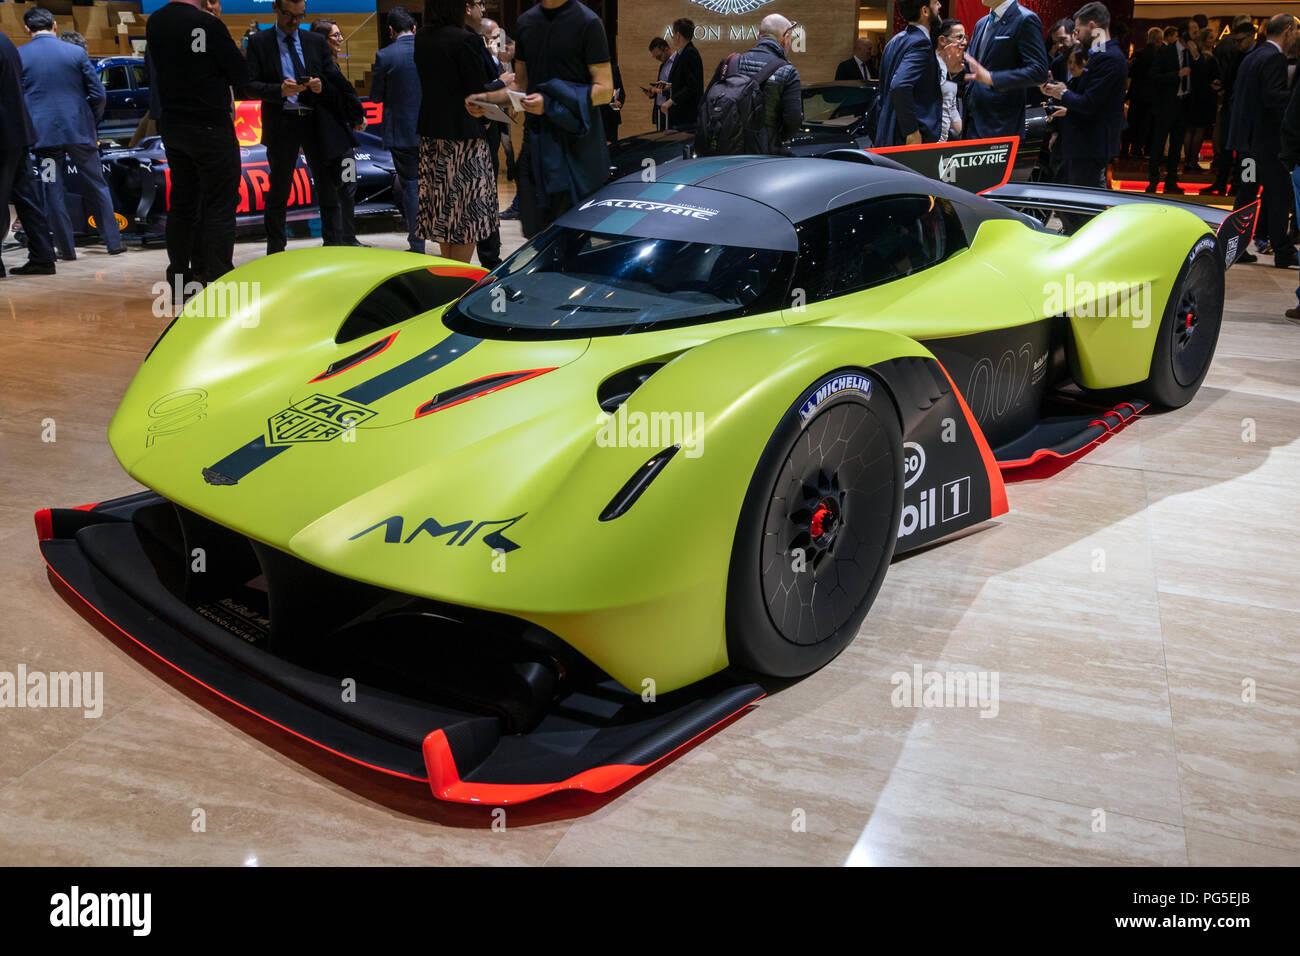 GENEVA, SWITZERLAND - MARCH 6, 2018: Aston Martin Valkyrie AMR Pro sports car showcased at the 88th Geneva International Motor Show. - Stock Image